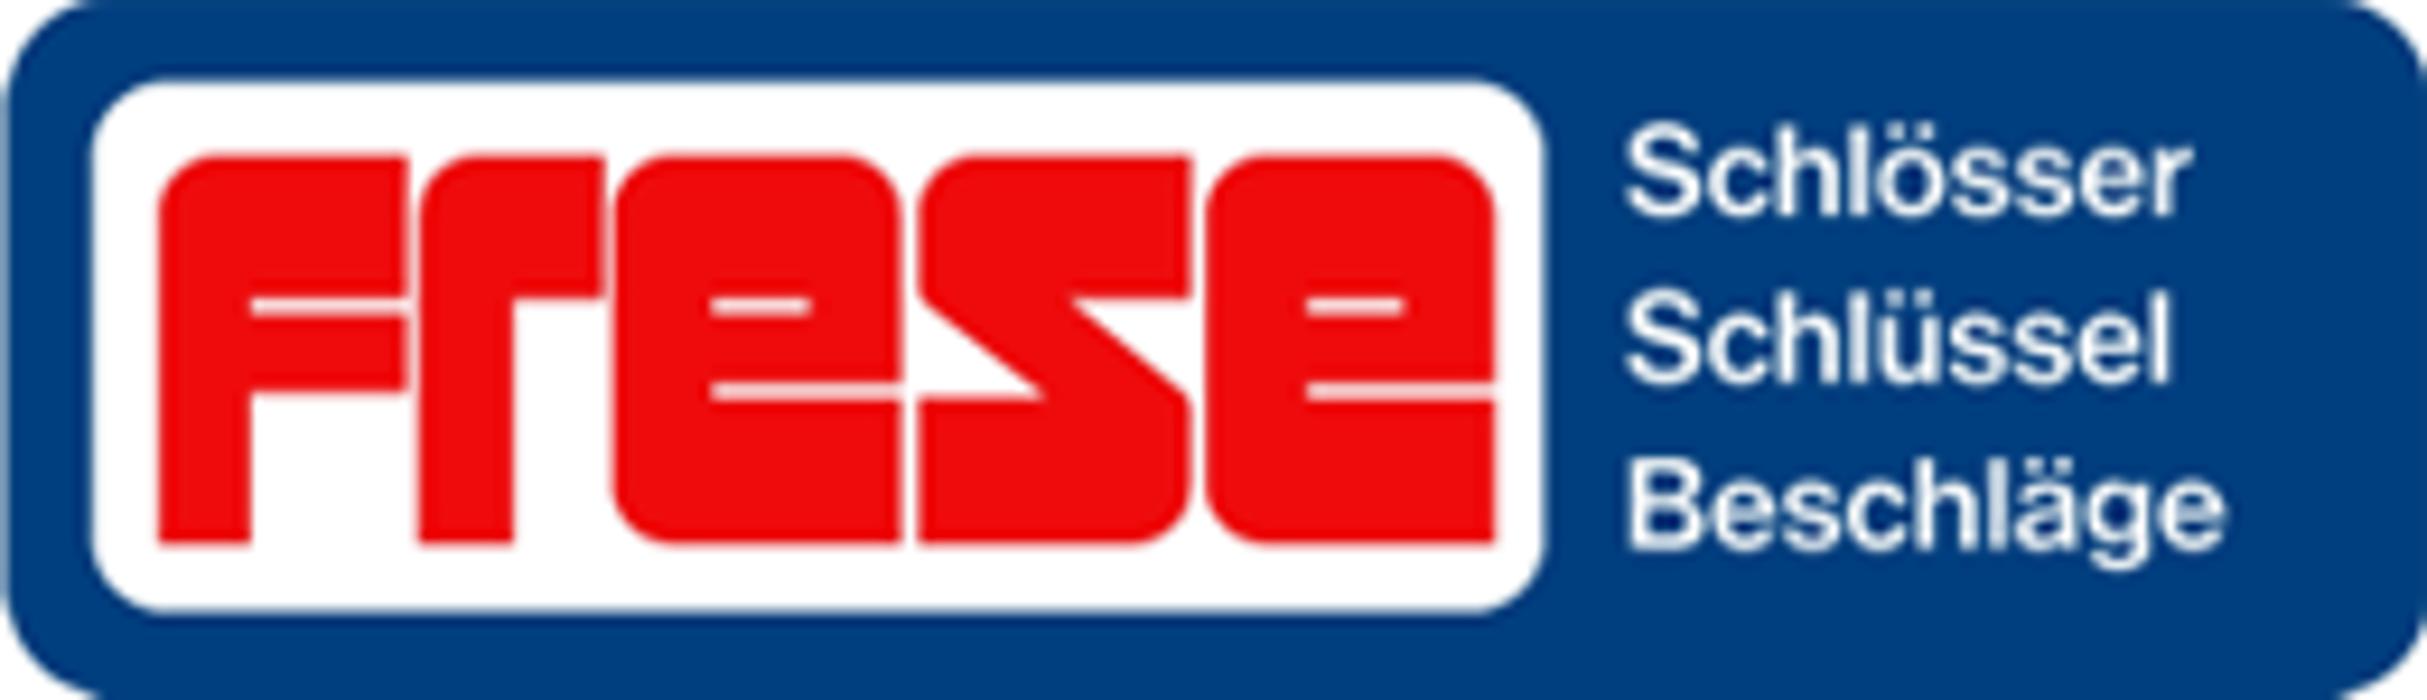 Wilhelm Frese GmbH